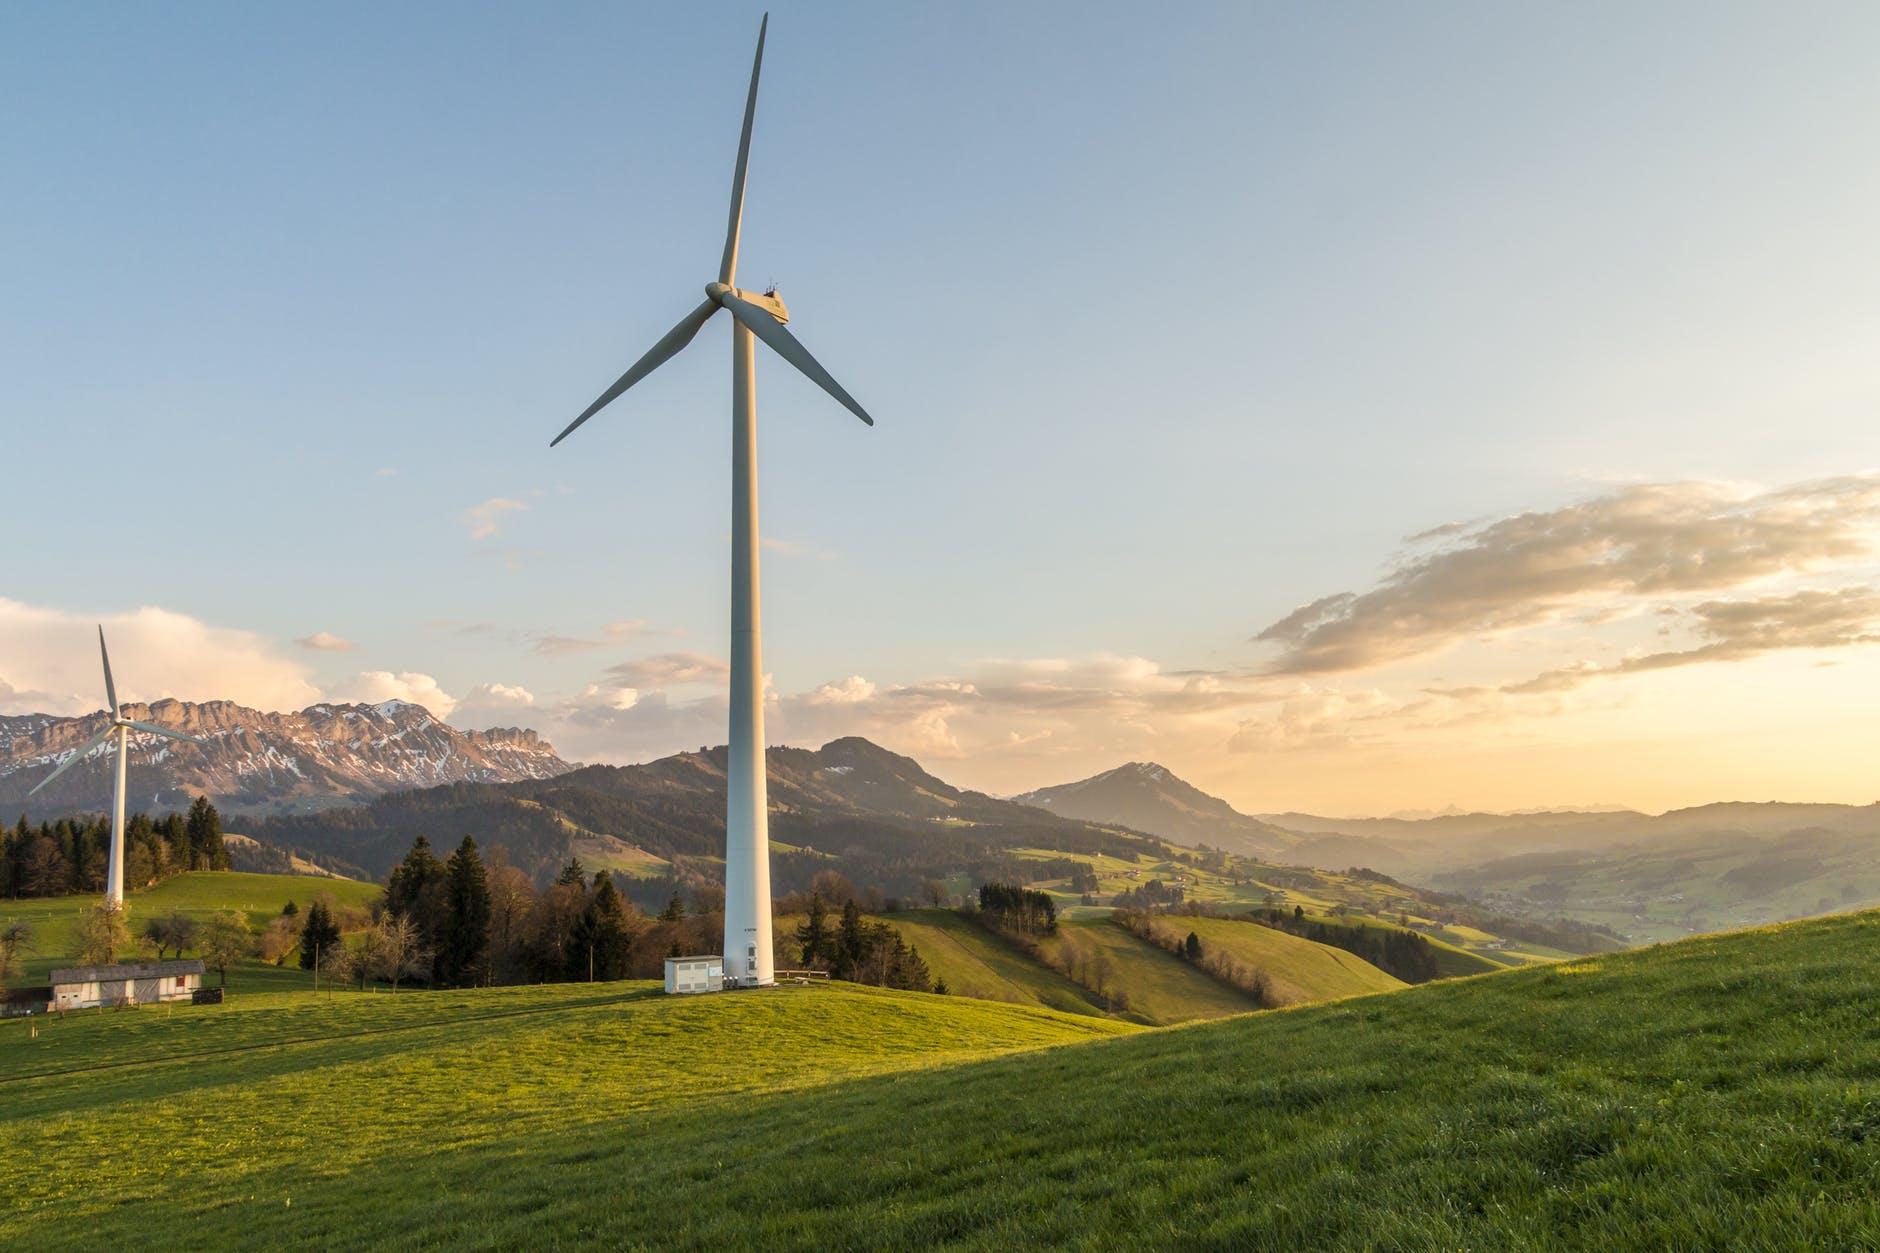 STEPHENS SCOWN ADVISES ON RENEWABLE ENERGY PROGRAMME -